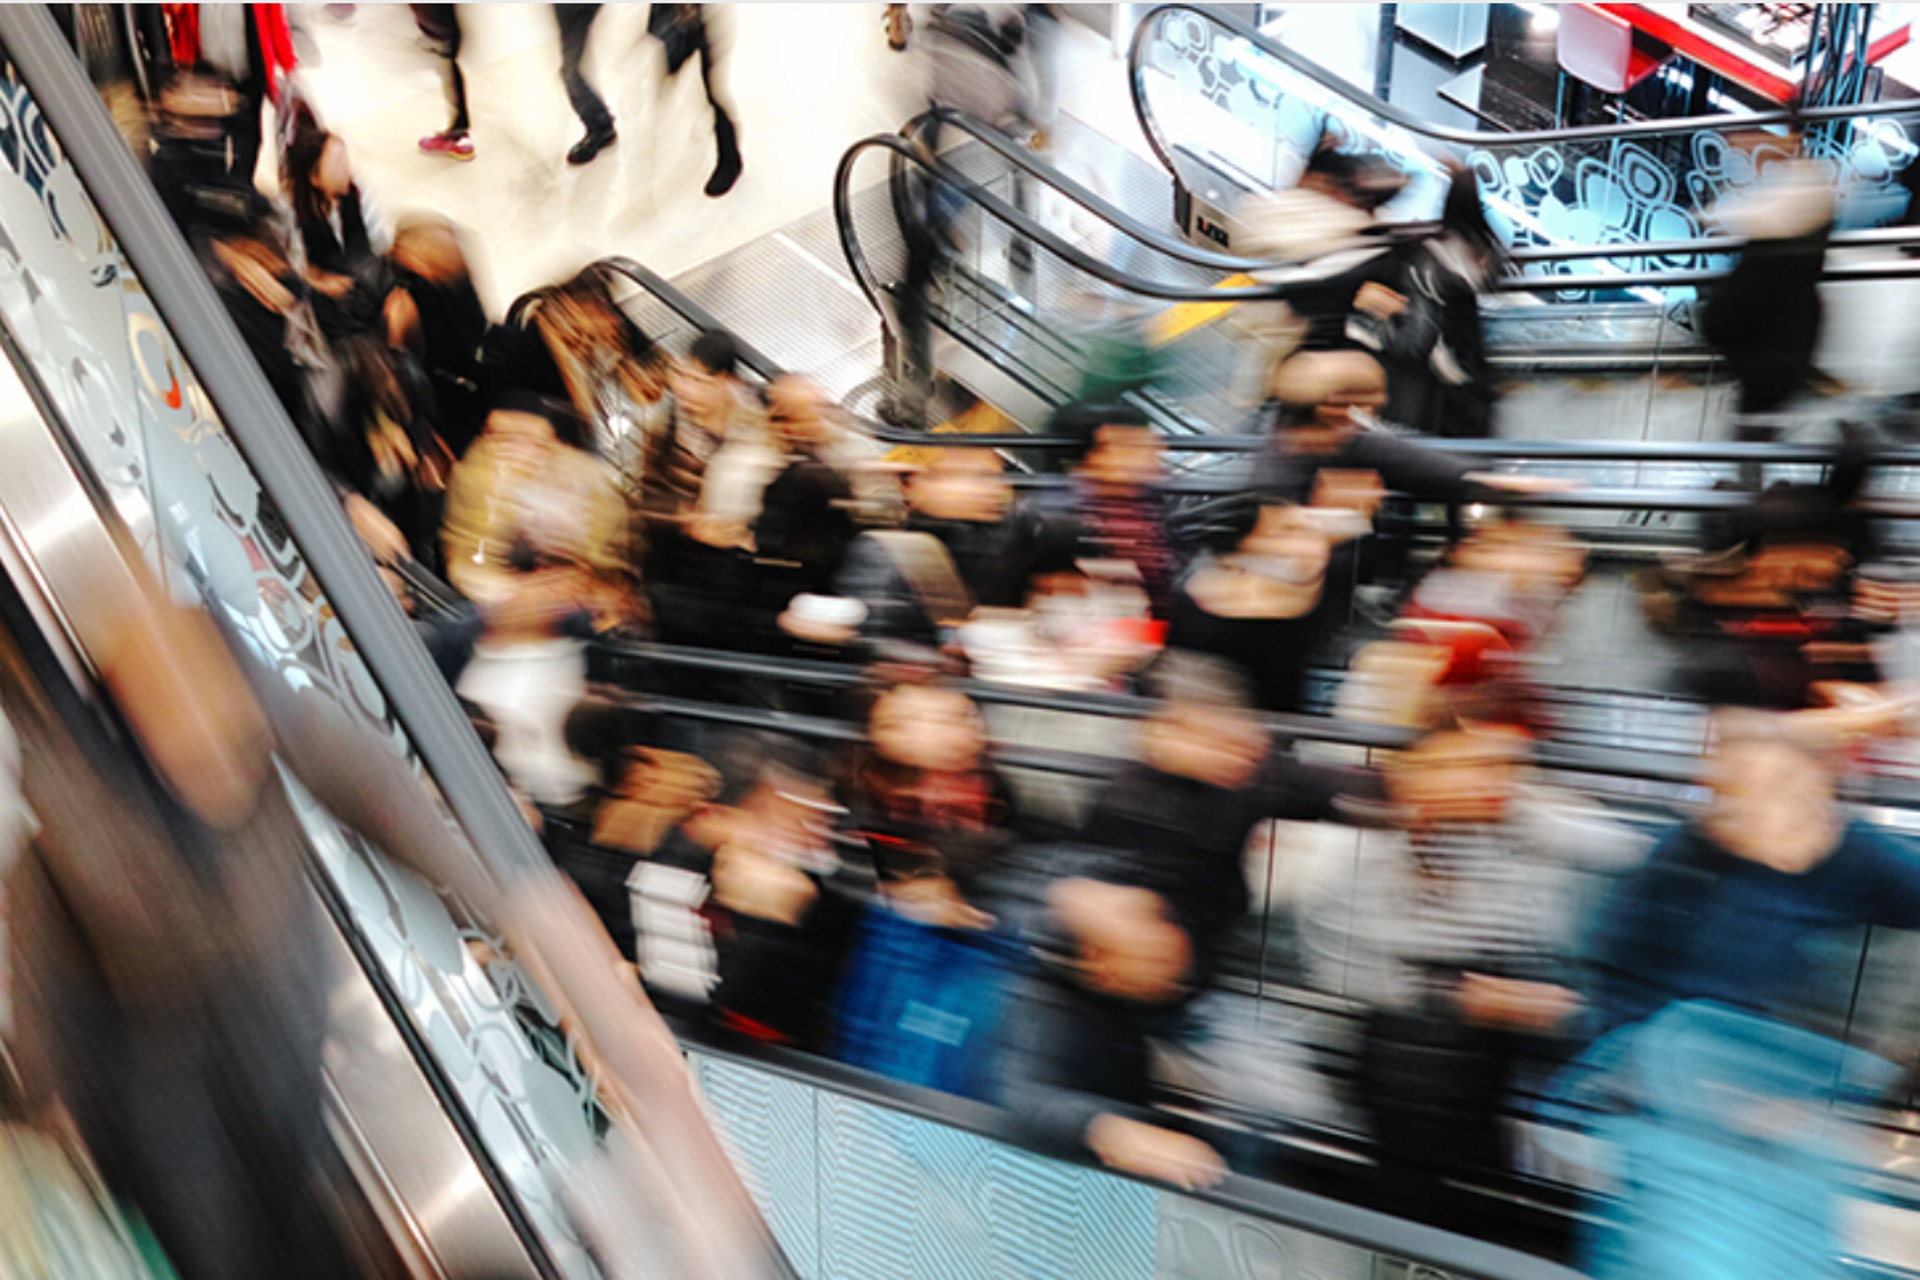 black friday social media shoppers